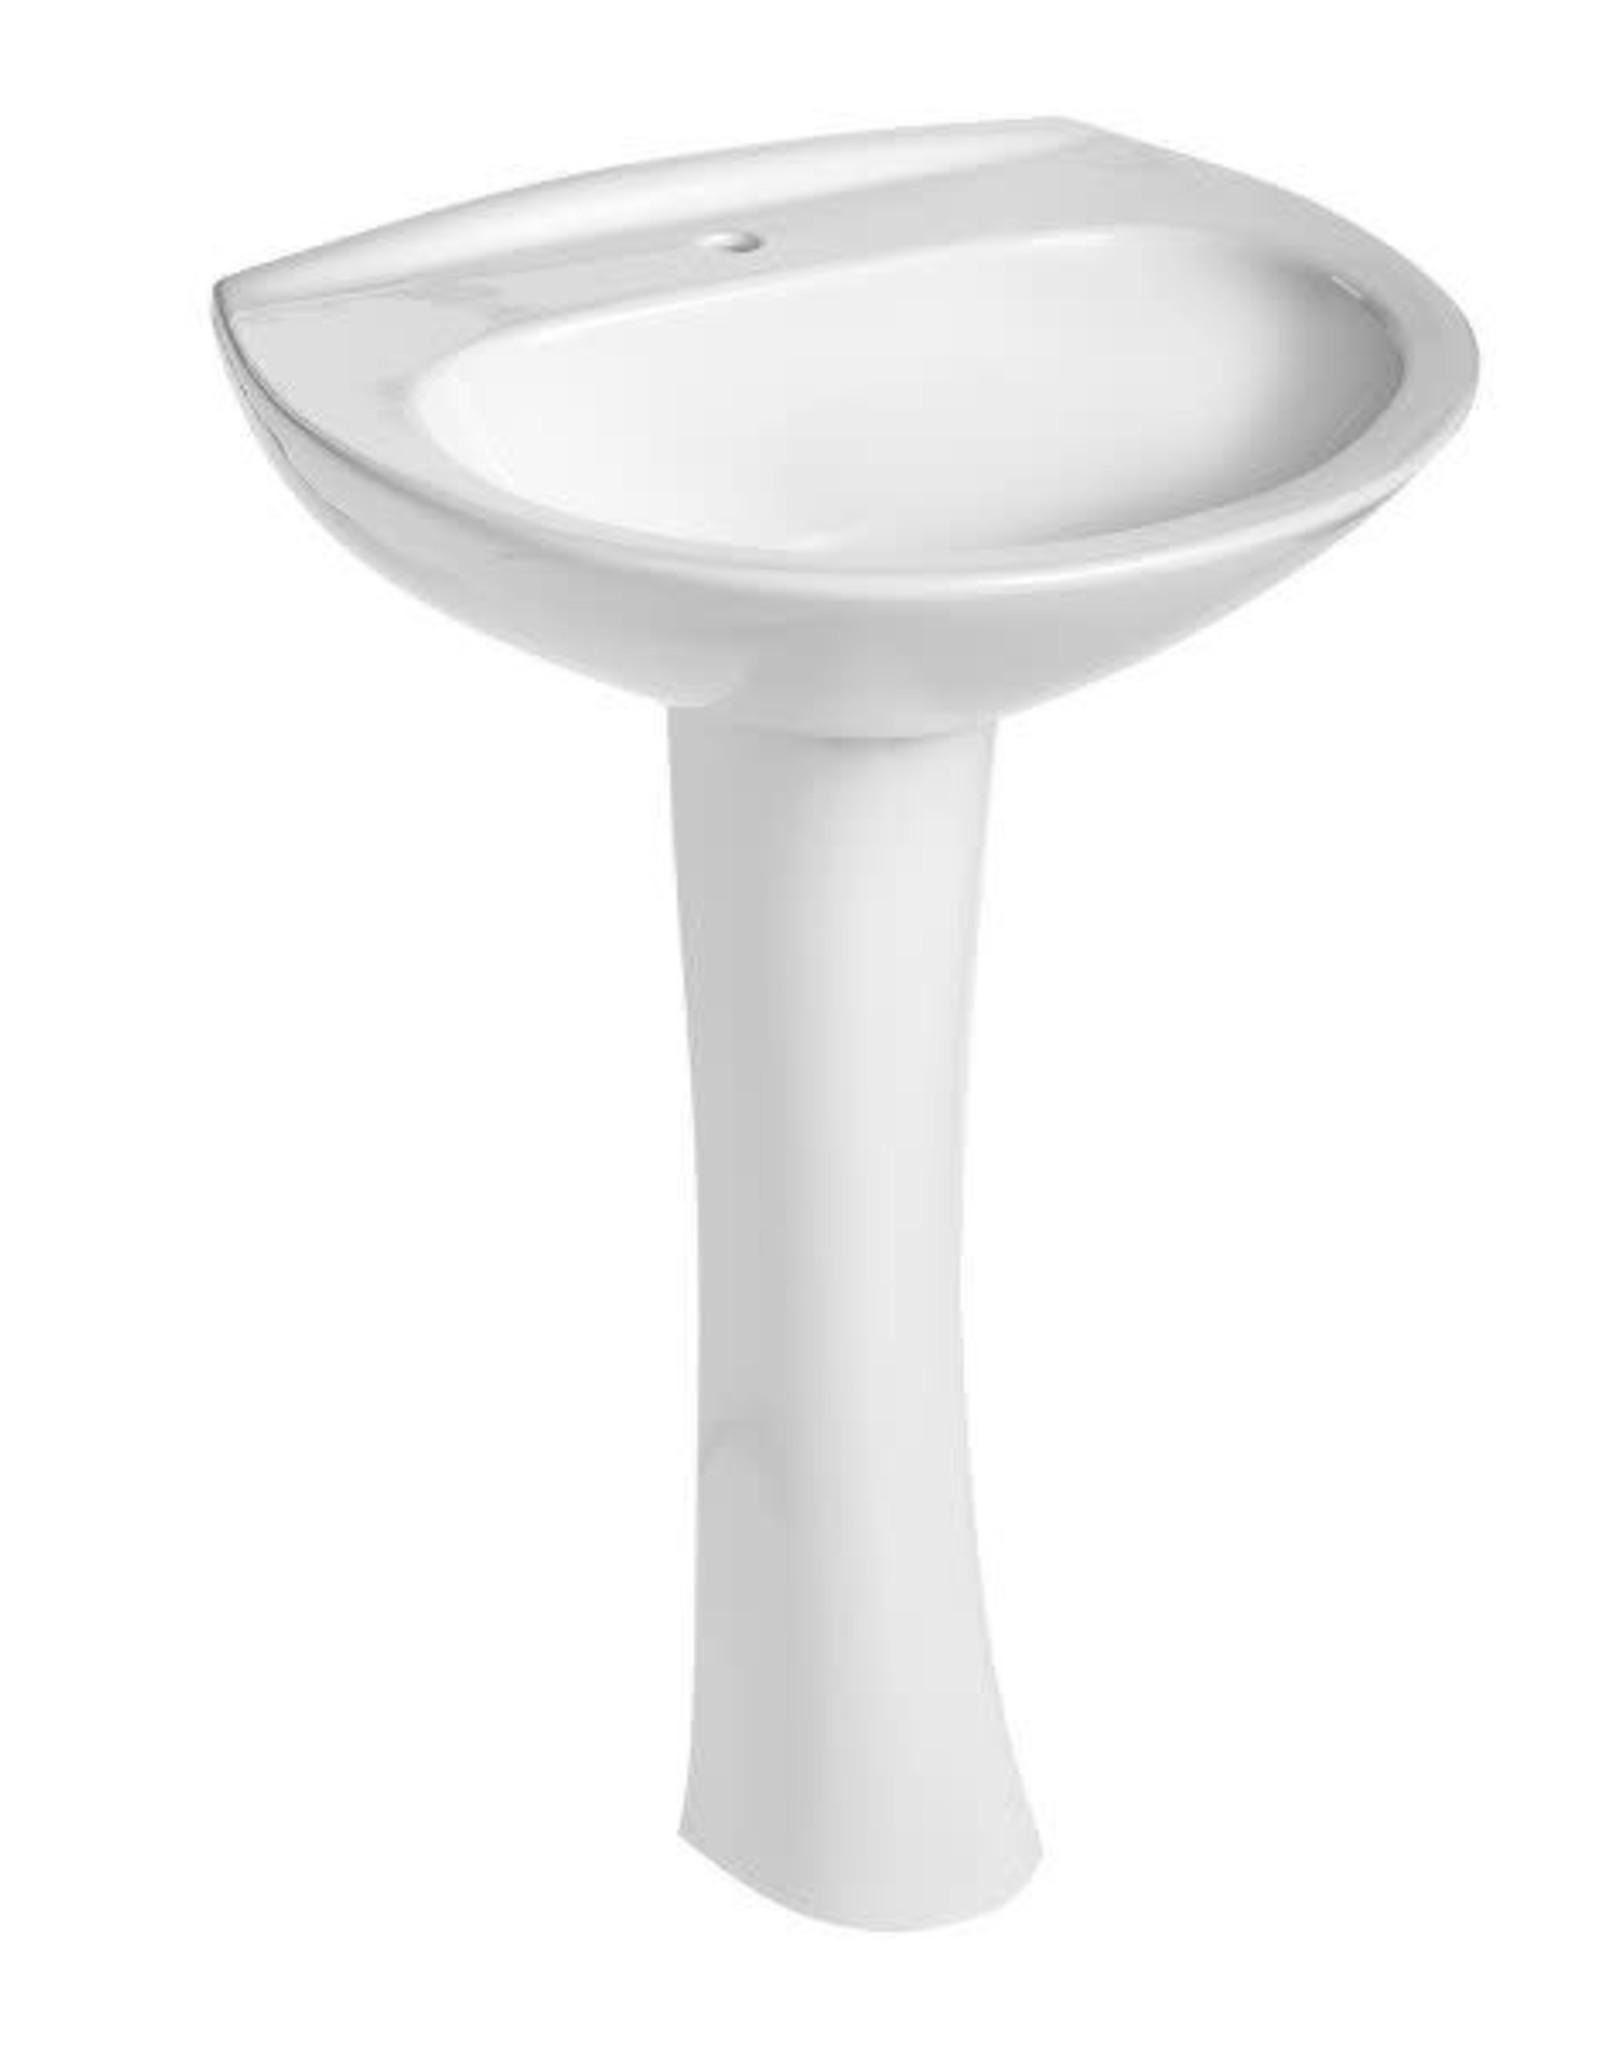 Mansfield Mansfield Alto Pedestal Combo- White Single Hole